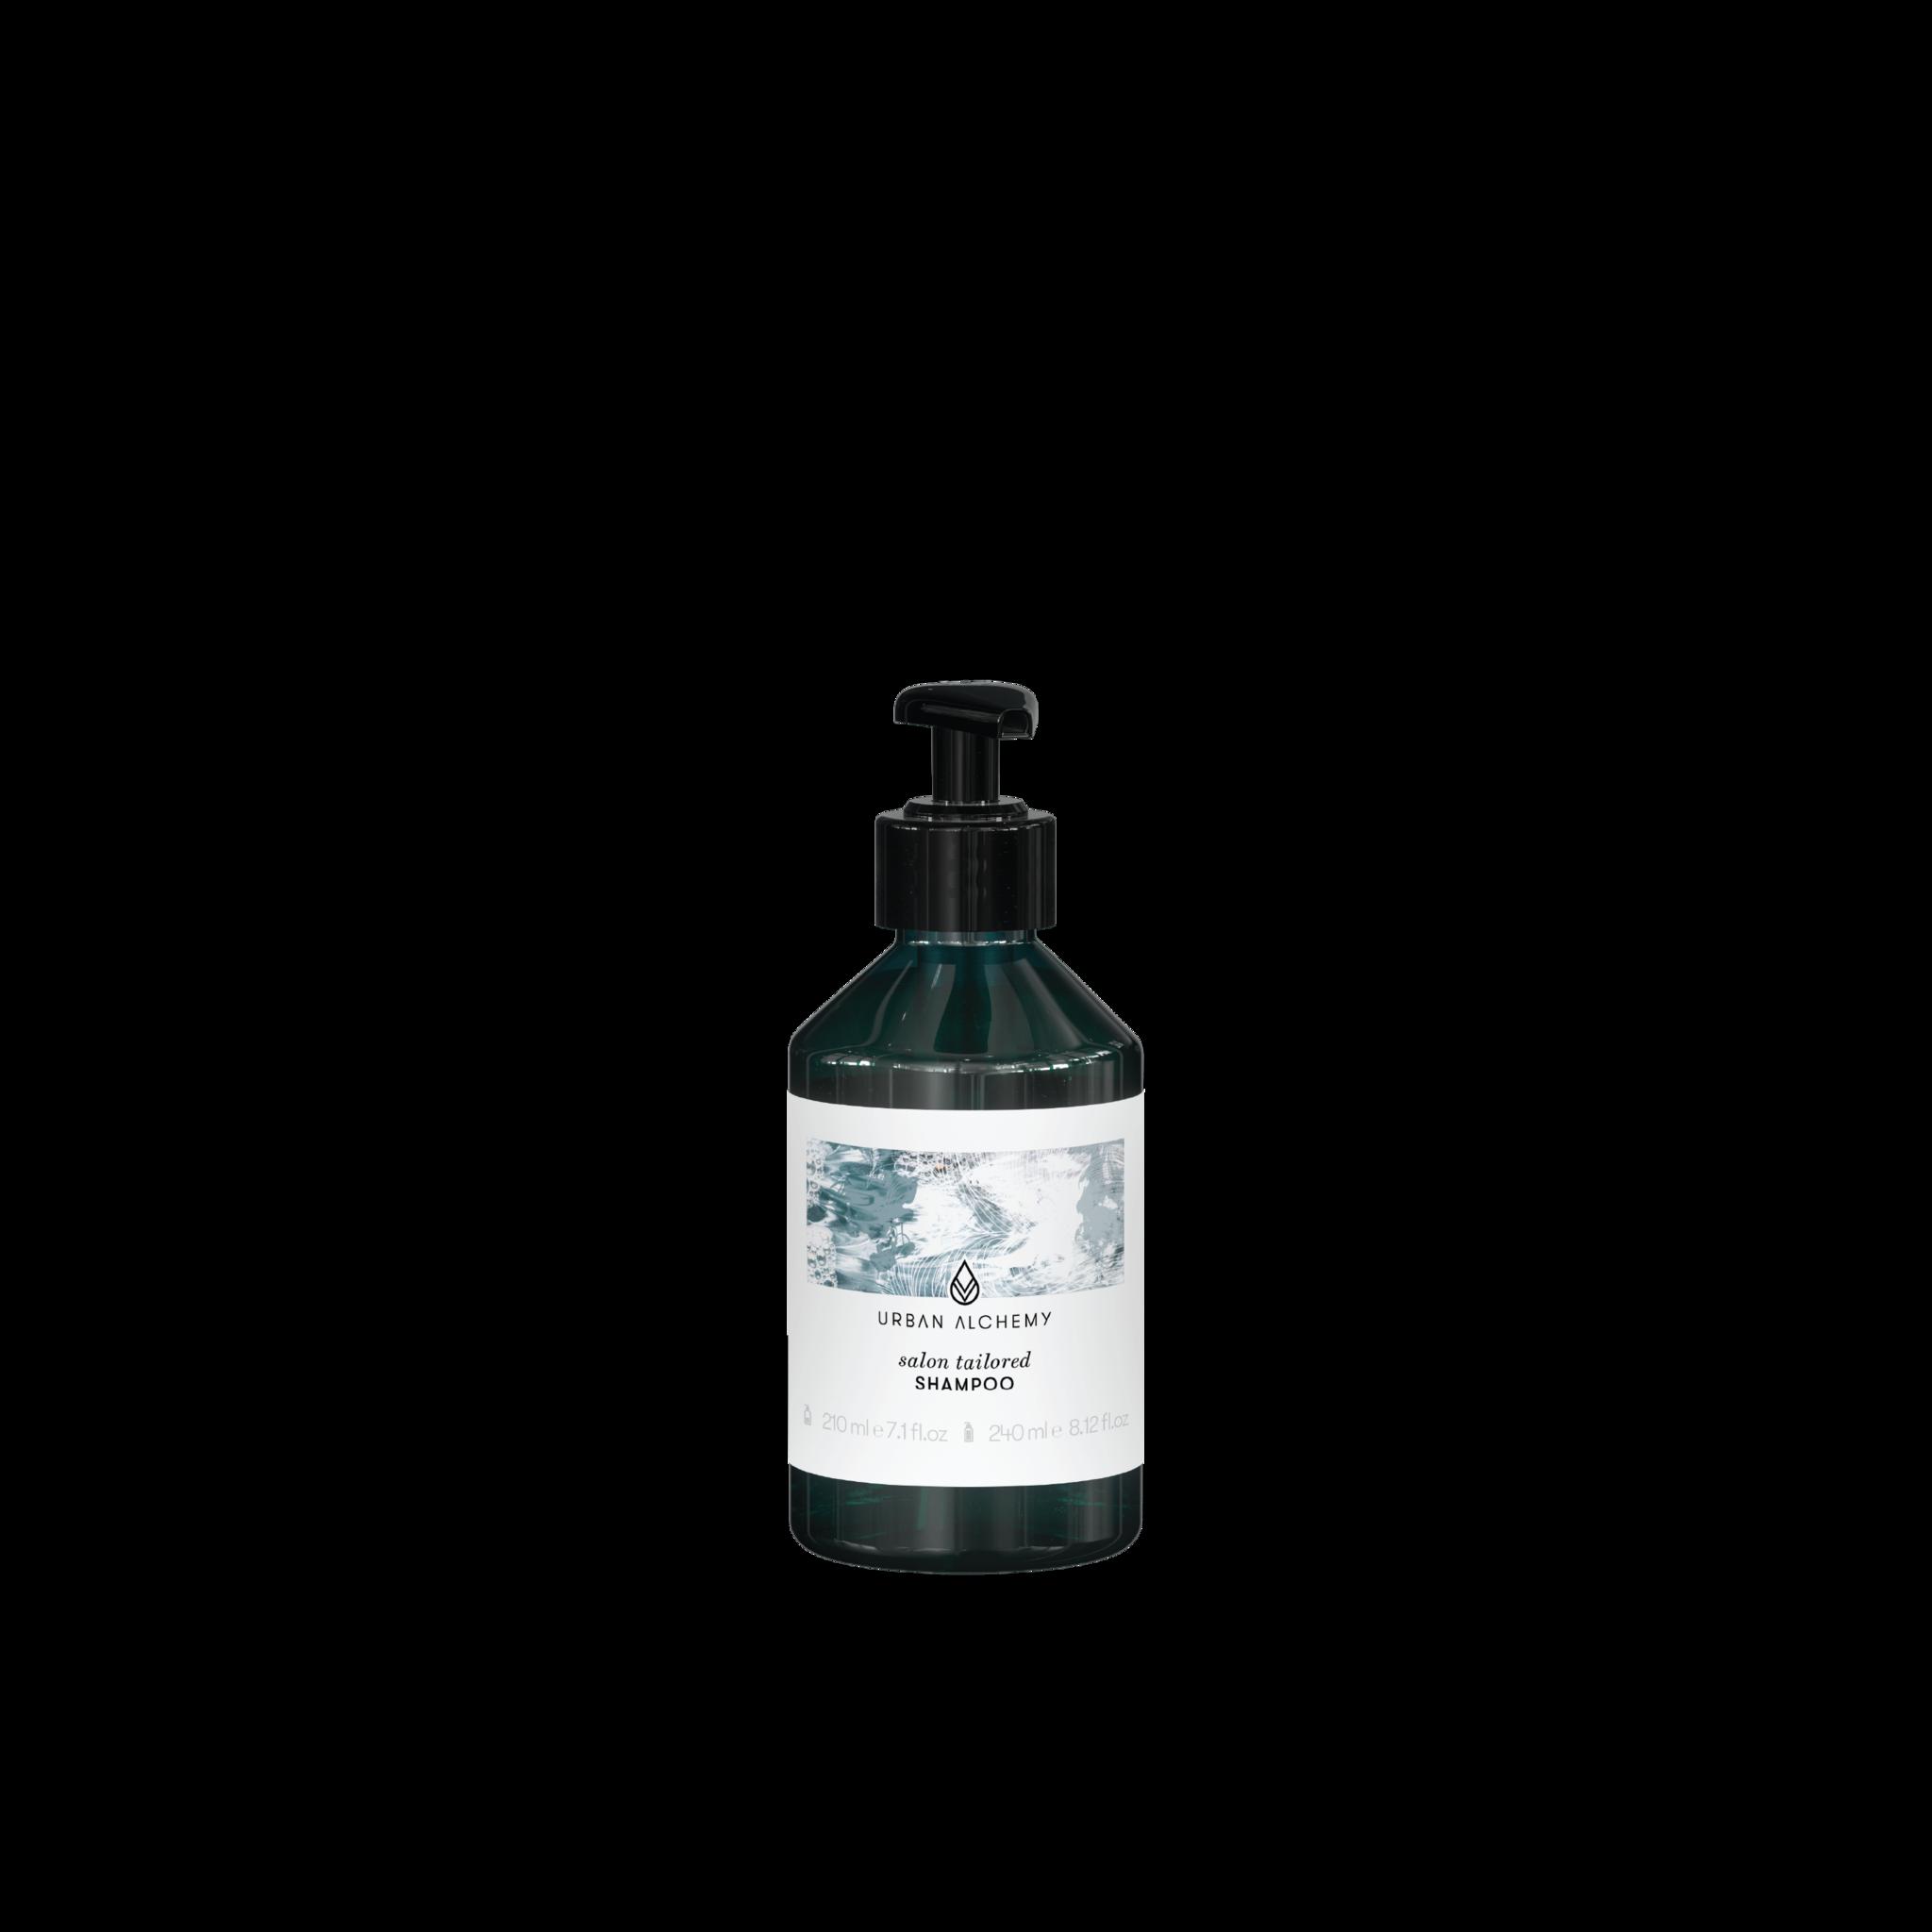 Urban Alchemy Prescription Care shampoing pour la maison 210 ml / 240 ml